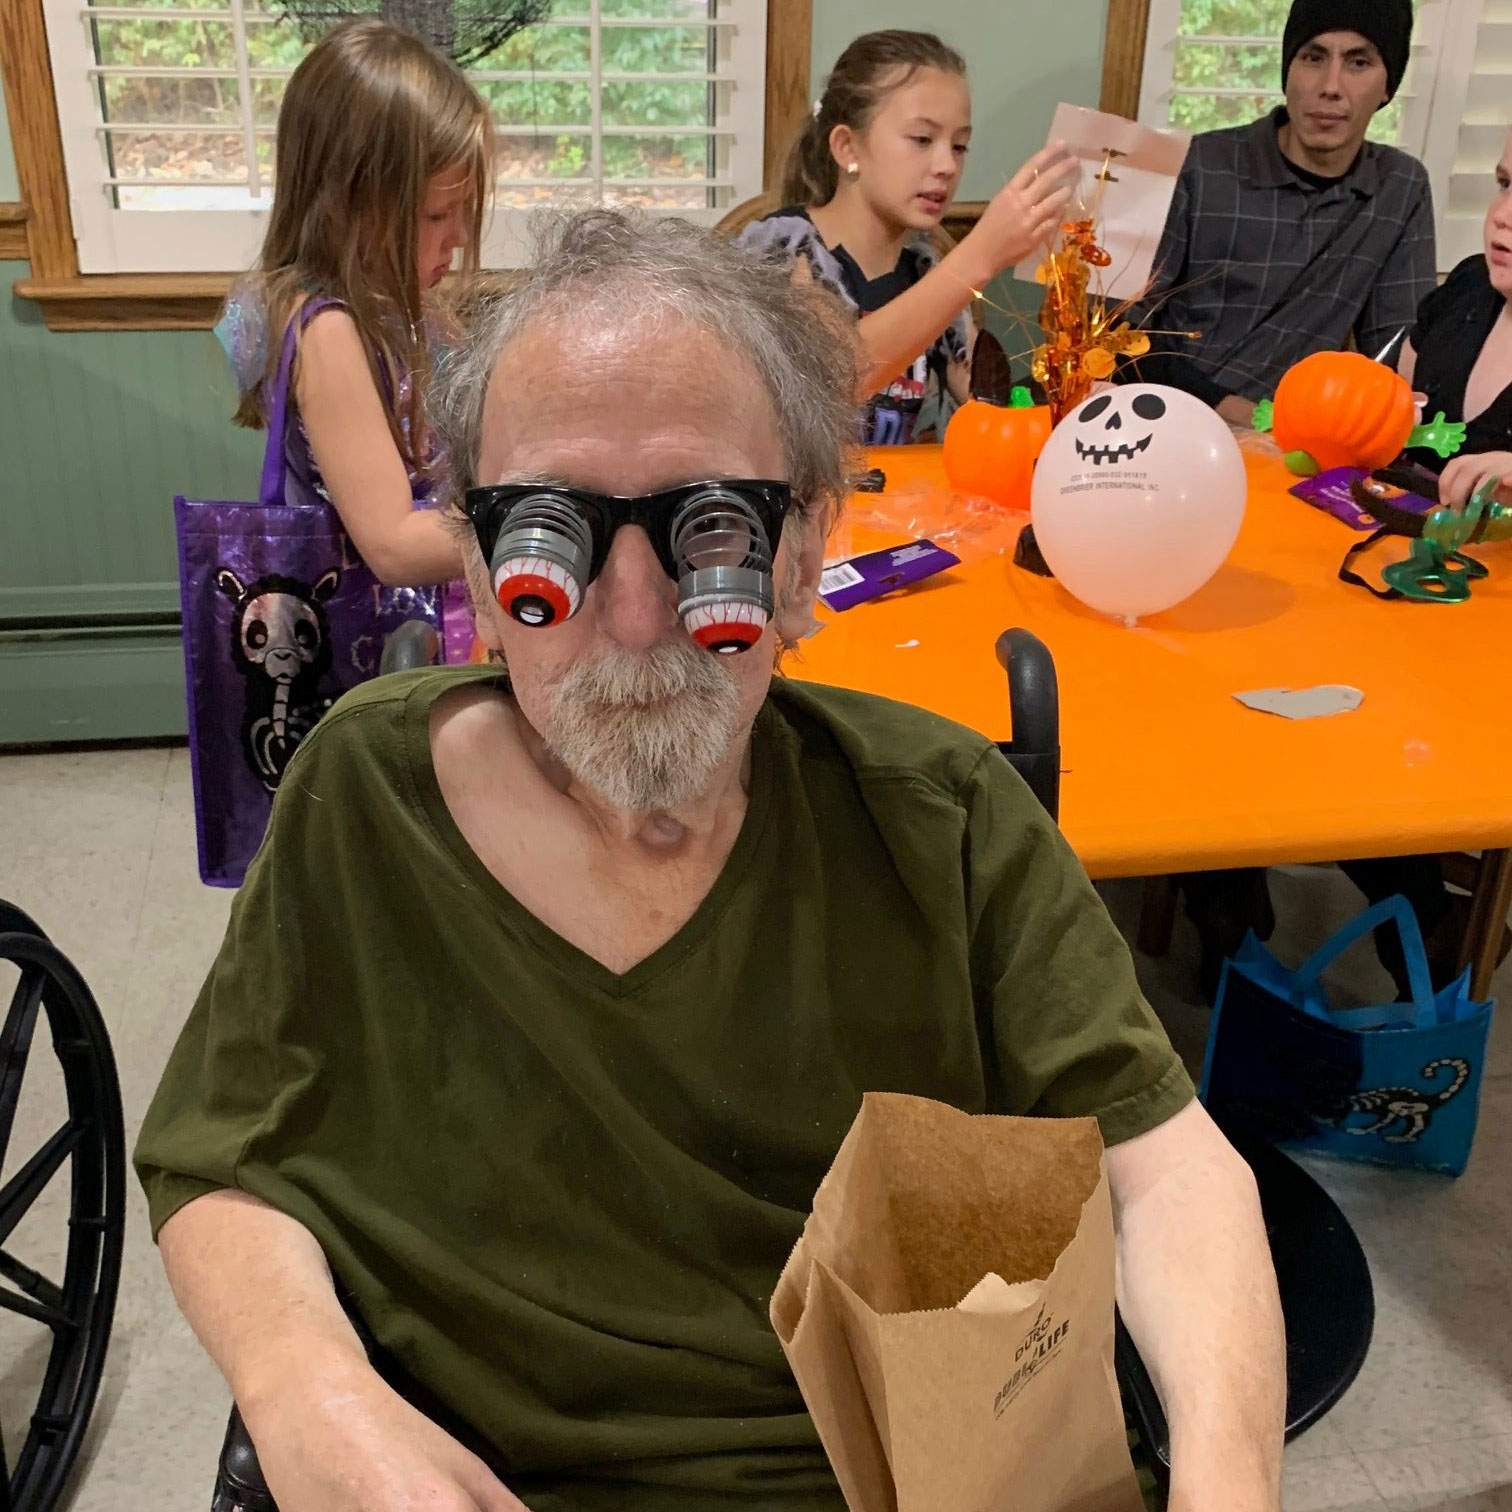 Halloween Paryt With Elderly People and Residents at Kadima at Pottstown Nursing and Rehabilitation Facility